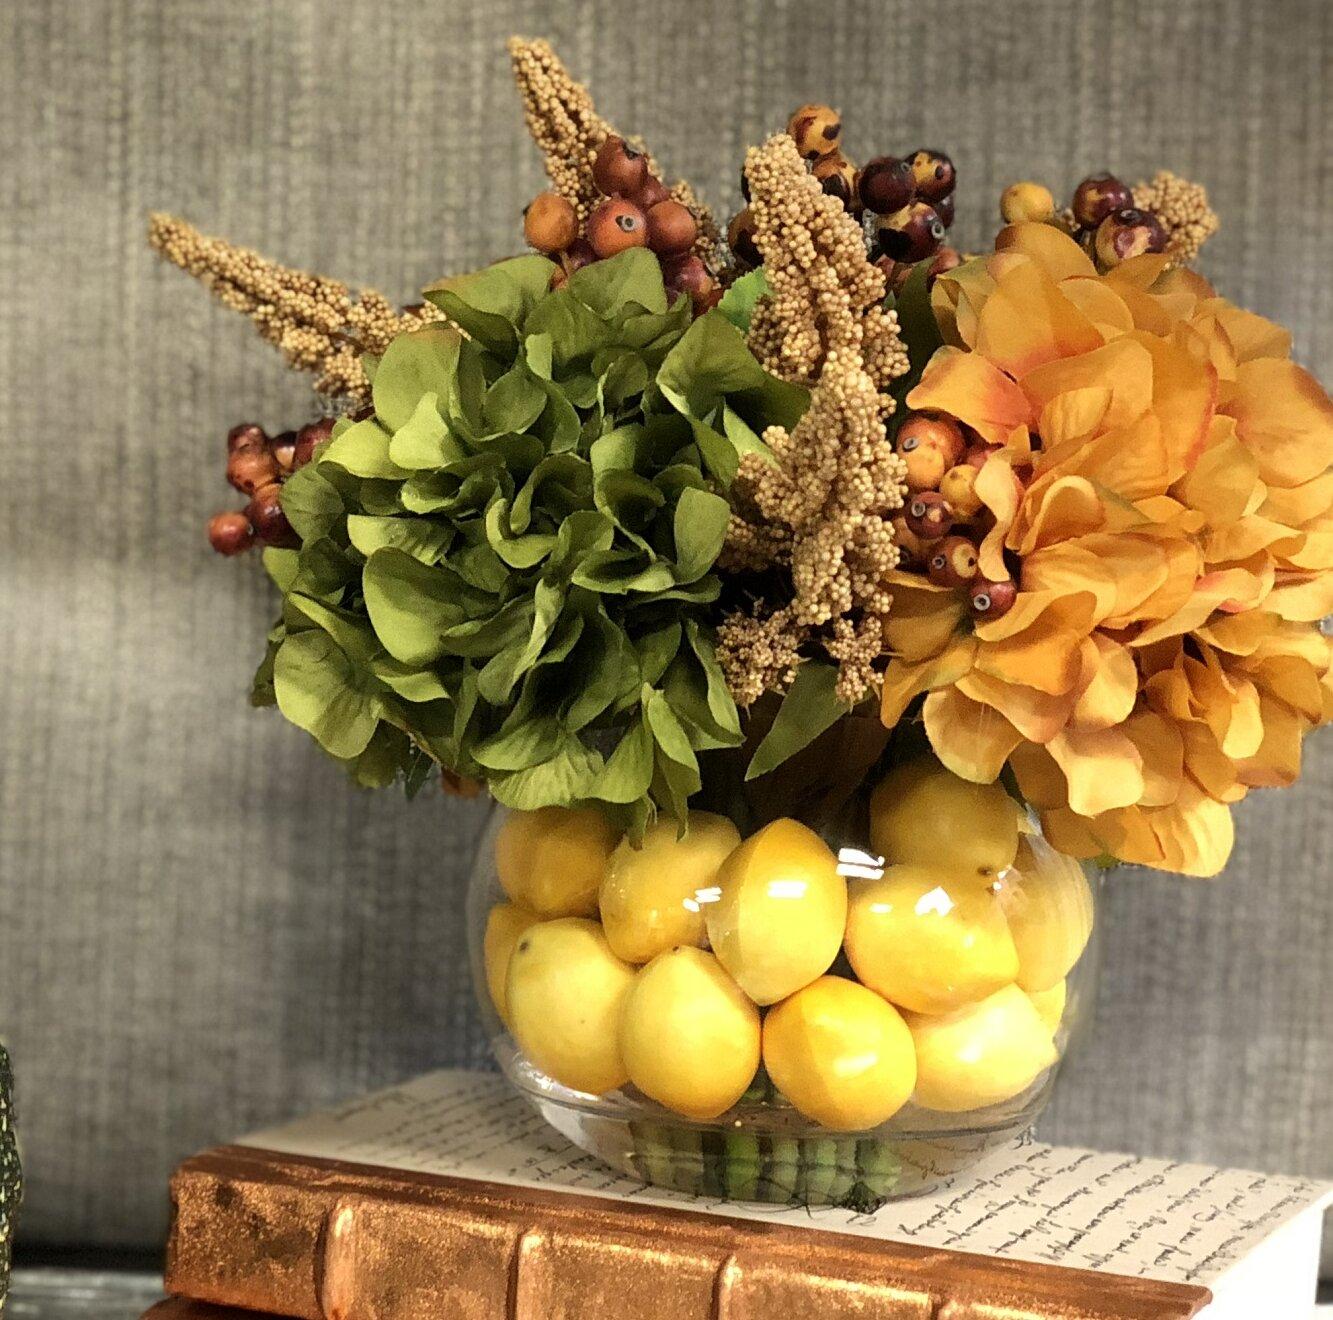 Charlton Home Mixed Hydrangeas Flower Centerpiece In Decorative Vase Reviews Wayfair